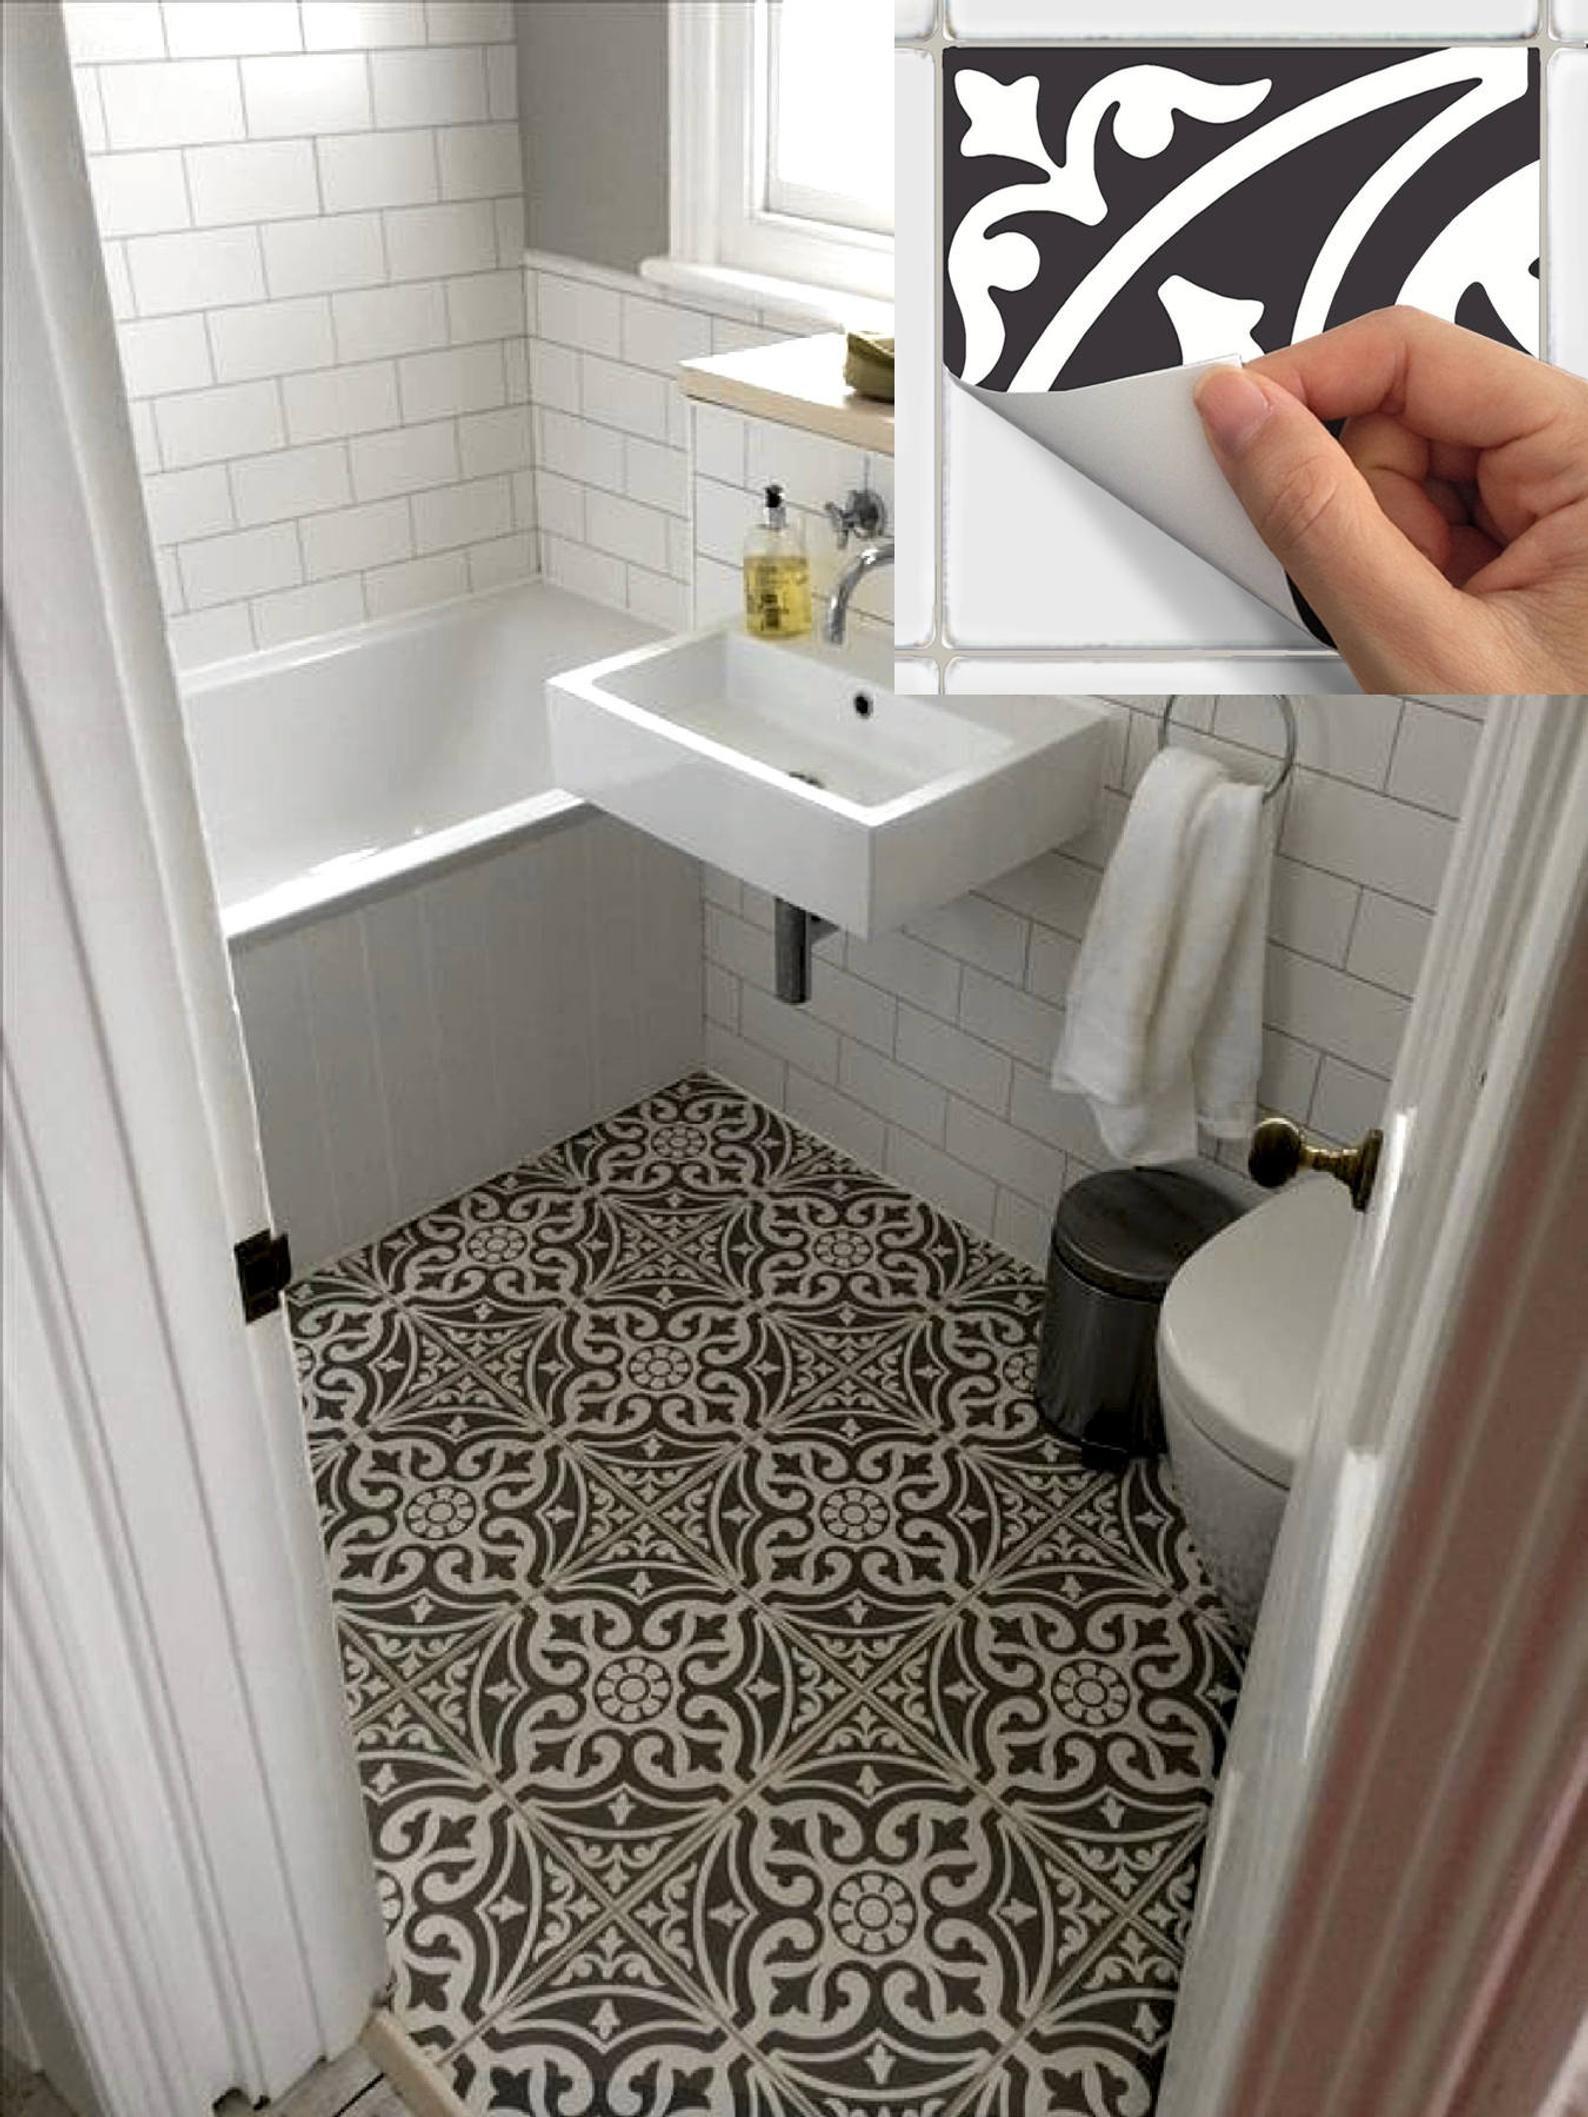 Floor Tile Sticker For Kitchen Bath Waterproof Removable Etsy With Images Bathroom Design Trends Tile Floor Bathroom Flooring